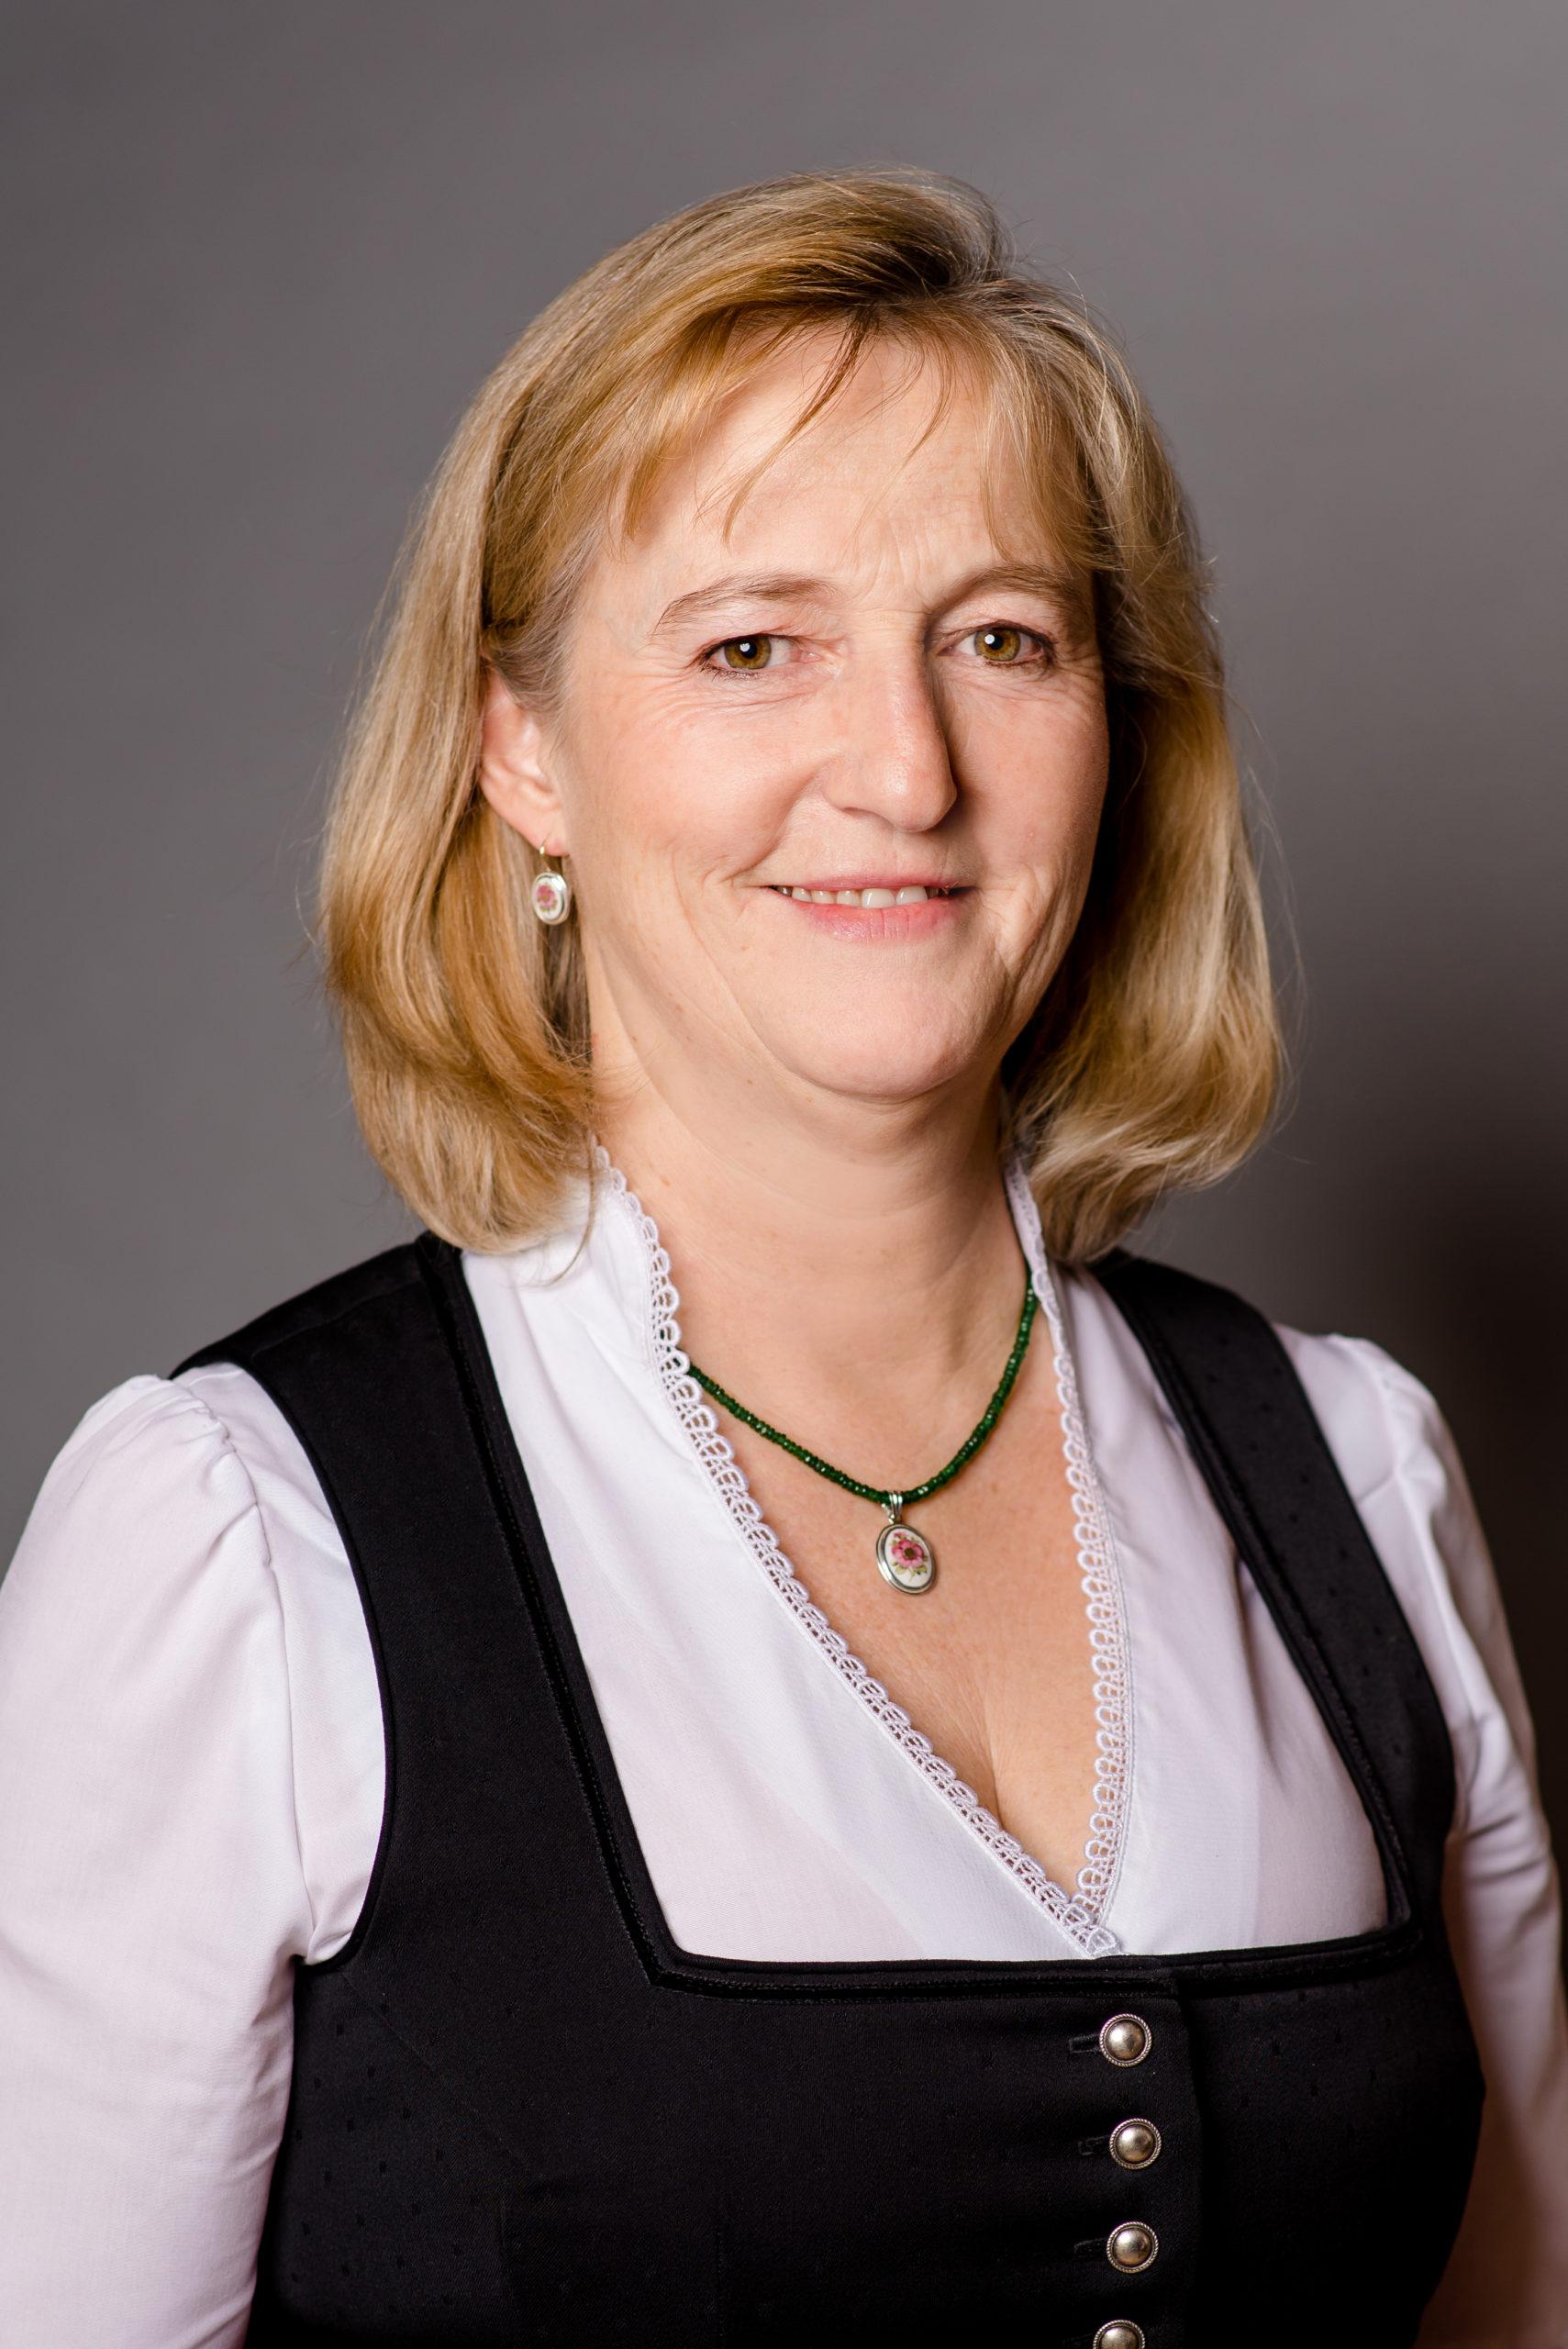 Angelika Salchegger